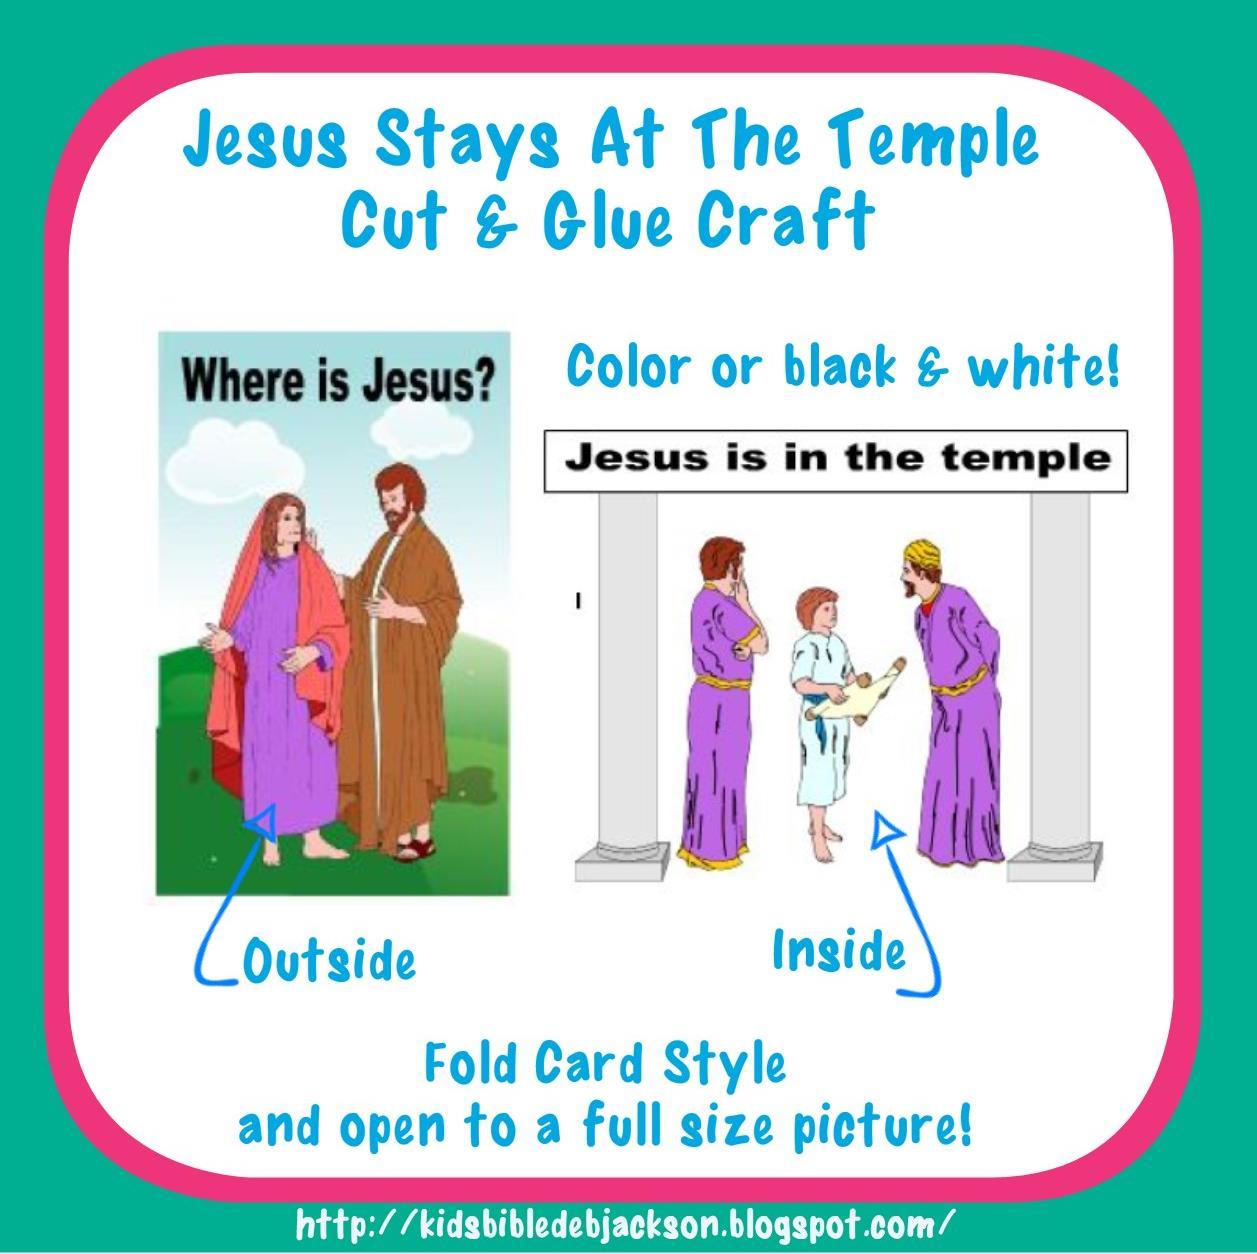 http://kidsbibledebjackson.blogspot.com/2014/06/jesus-stays-behind-at-temple.html